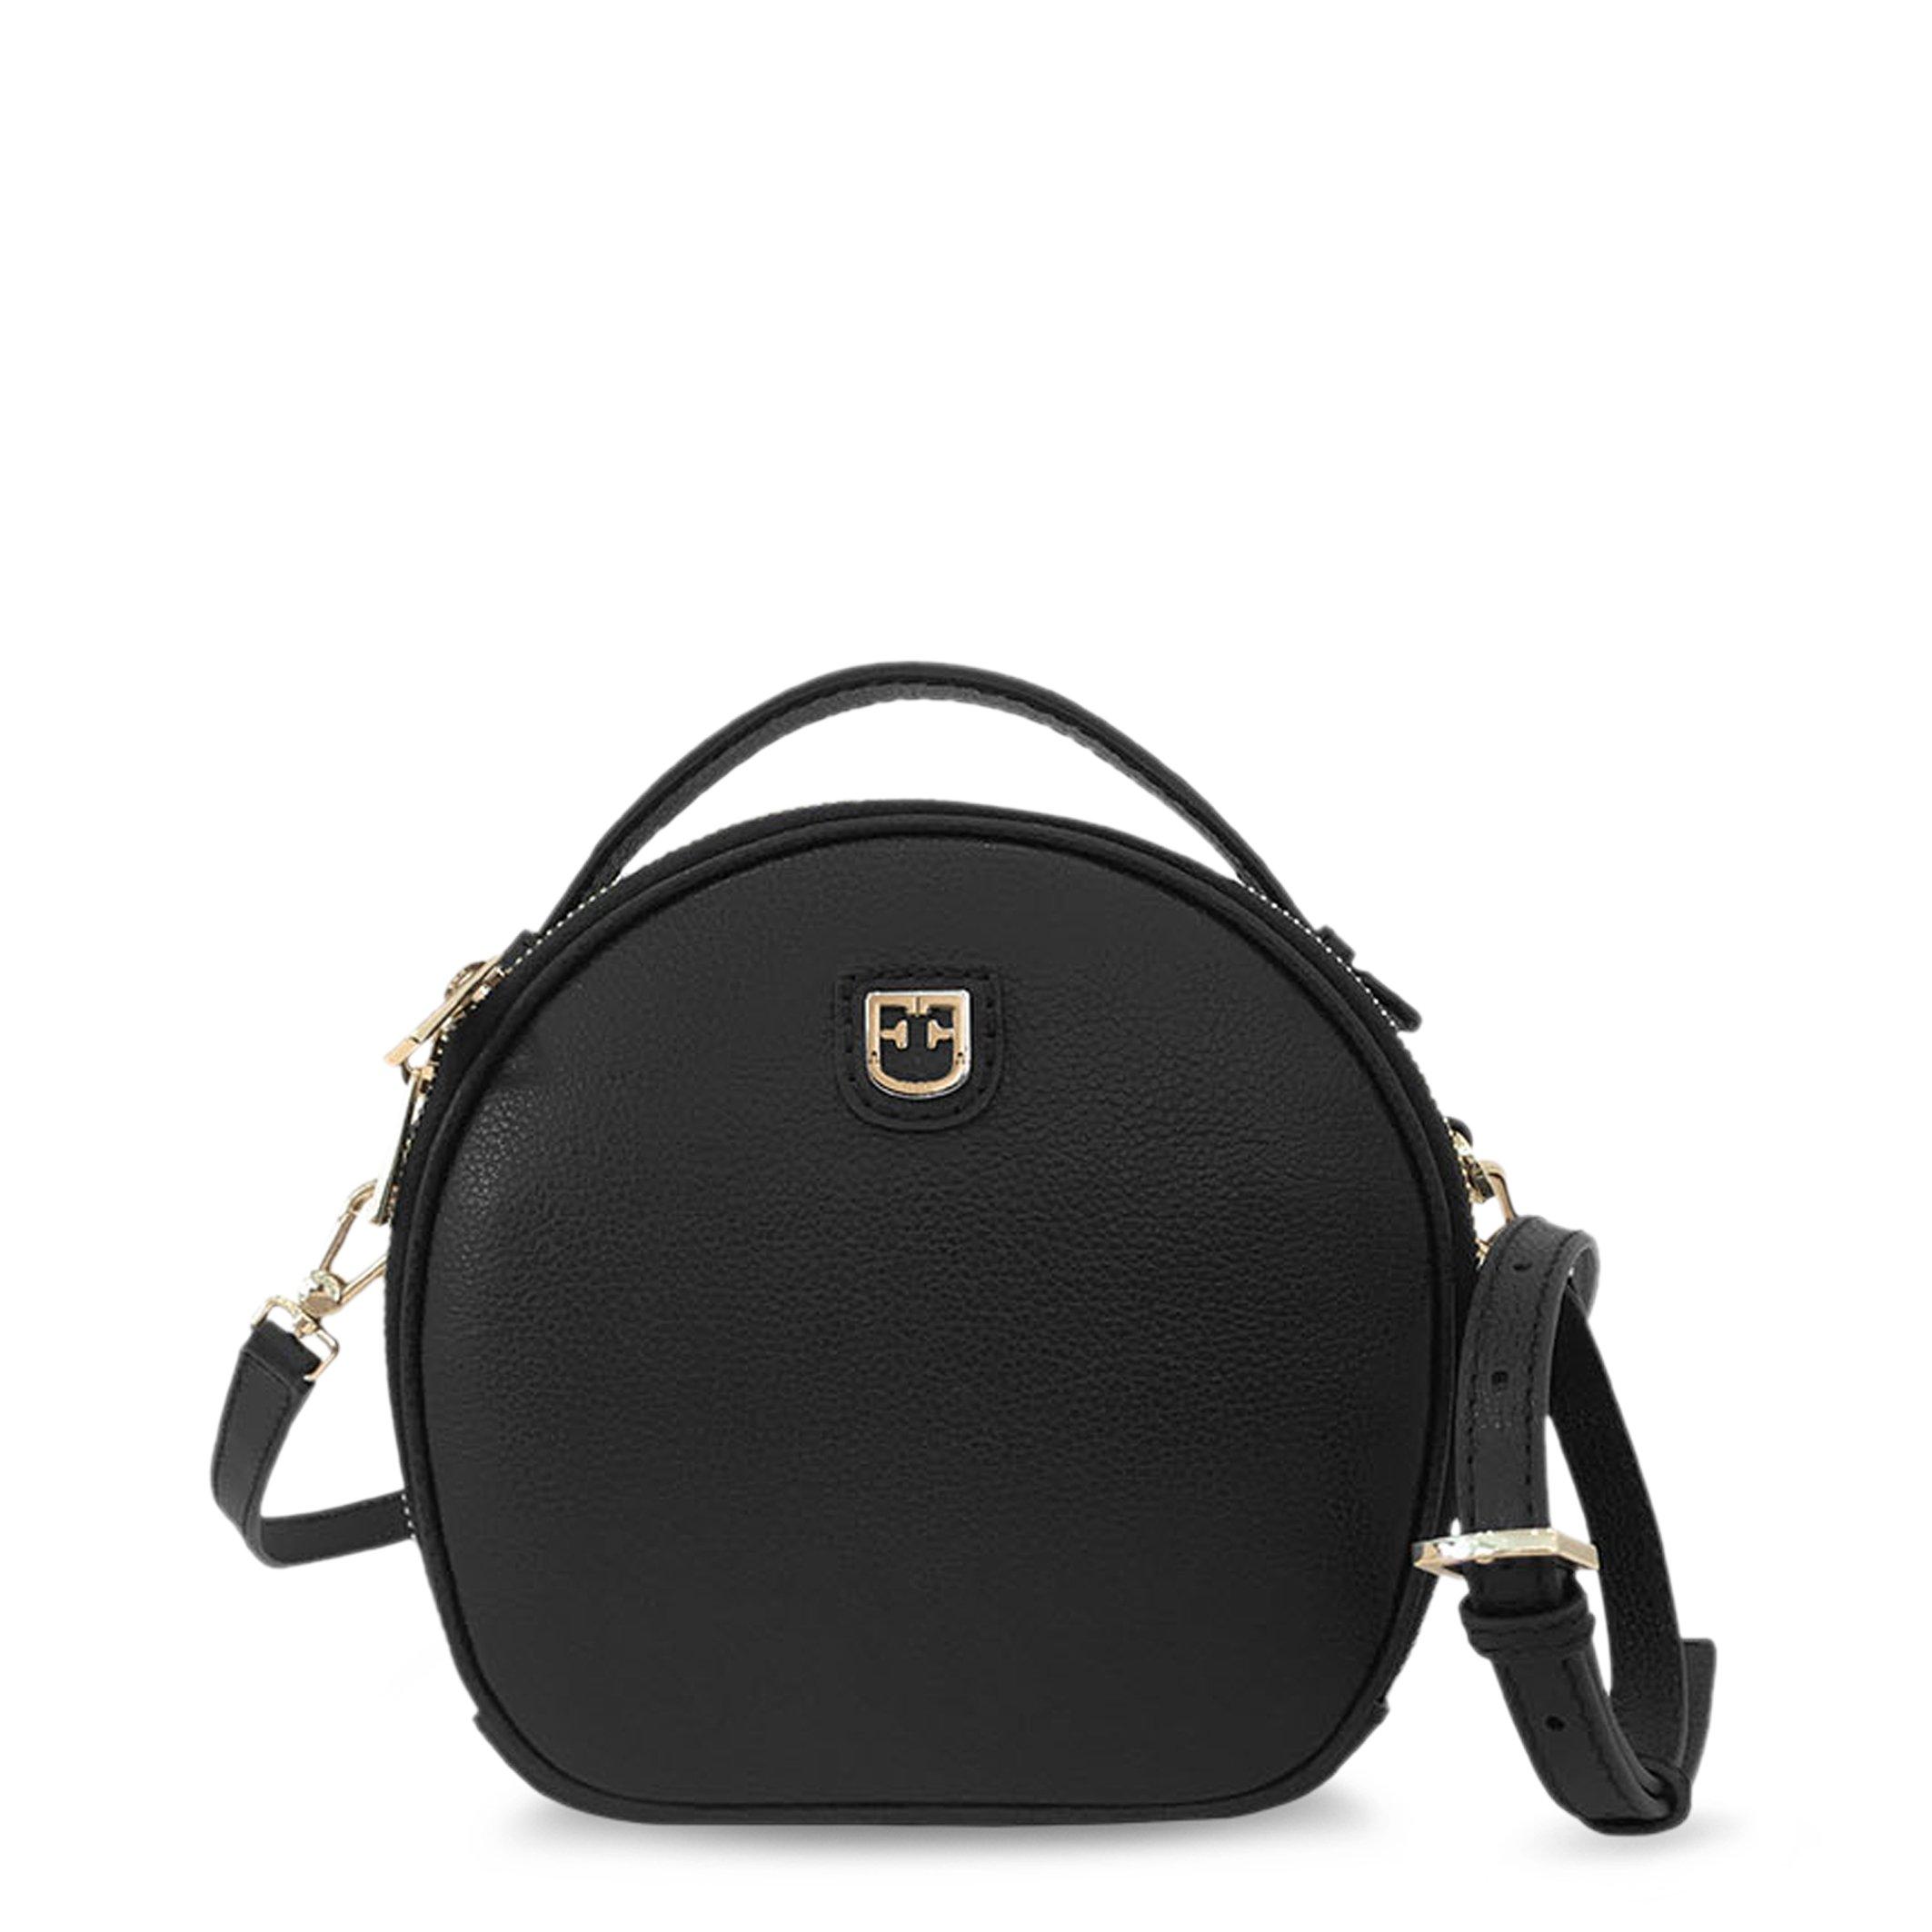 Furla Women's Handbag Various Colours DOTTY_WB00107 - black NOSIZE